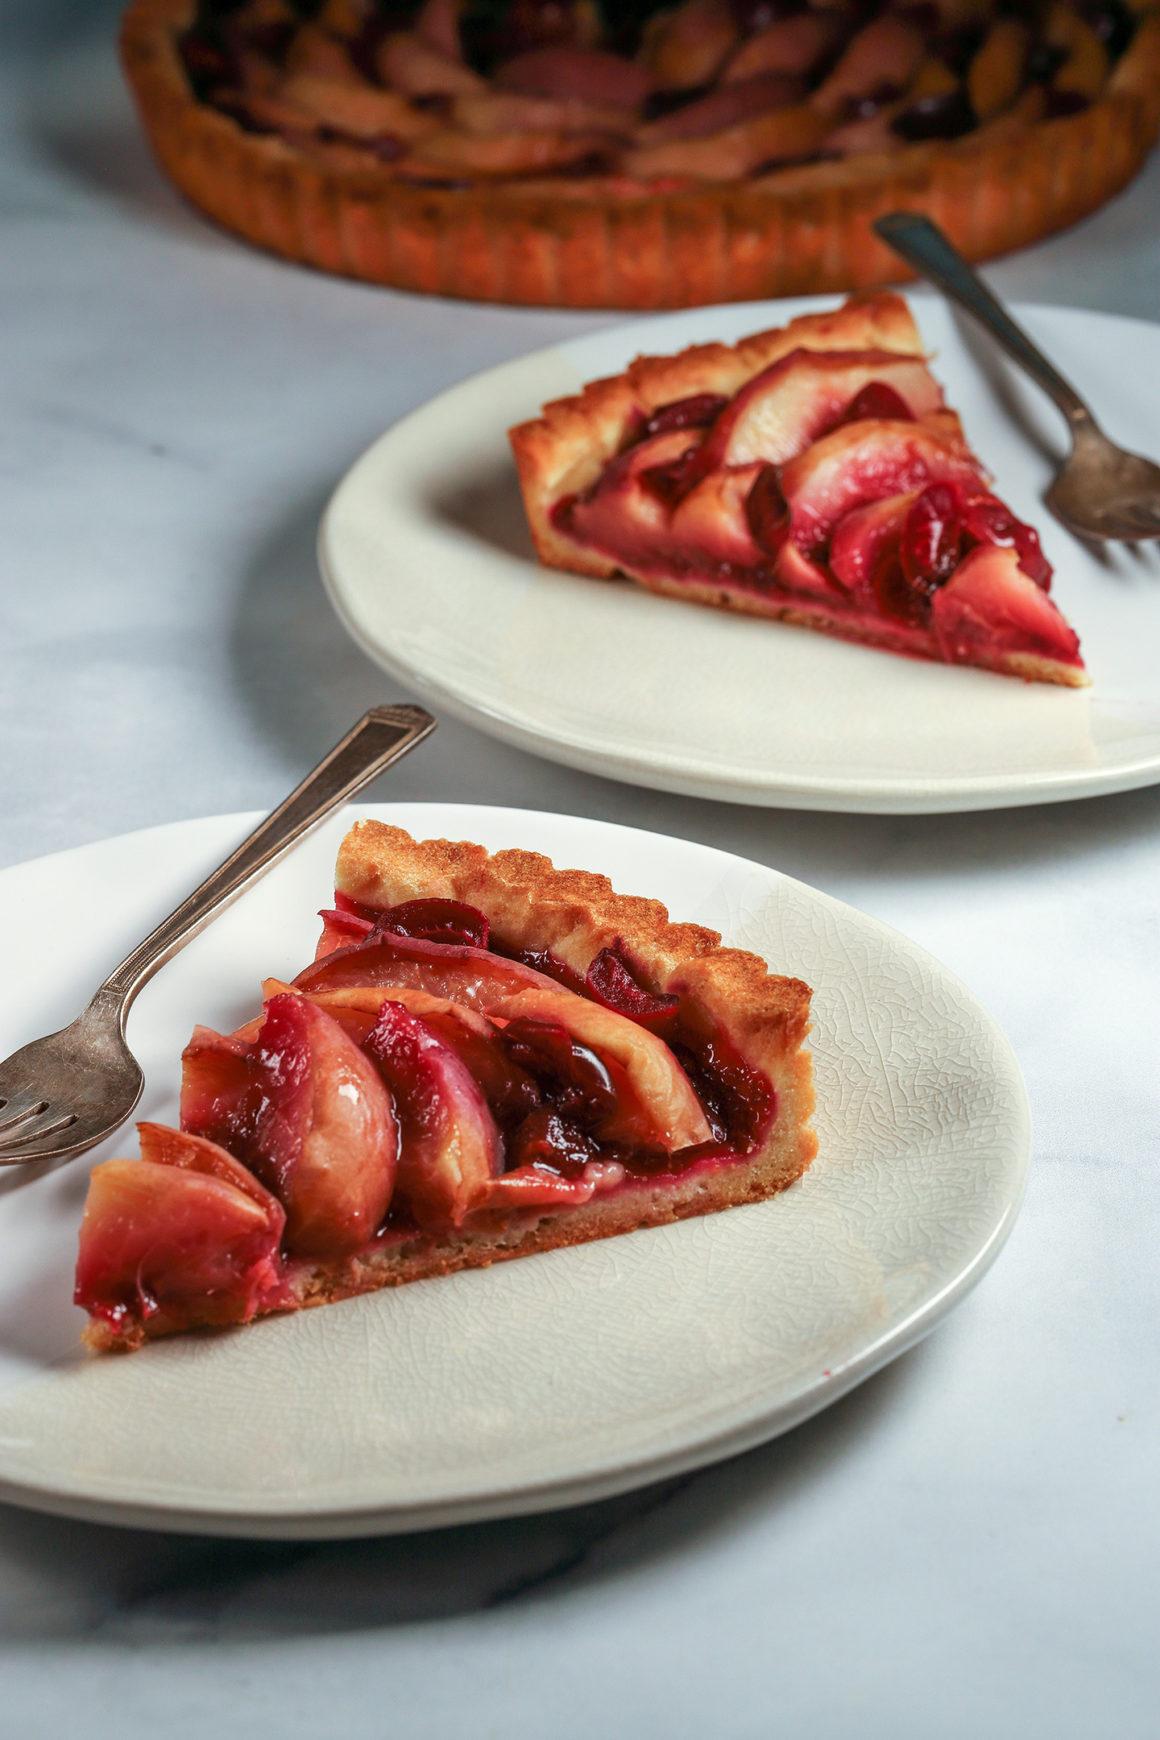 White Peach and Cherry Tart Slices